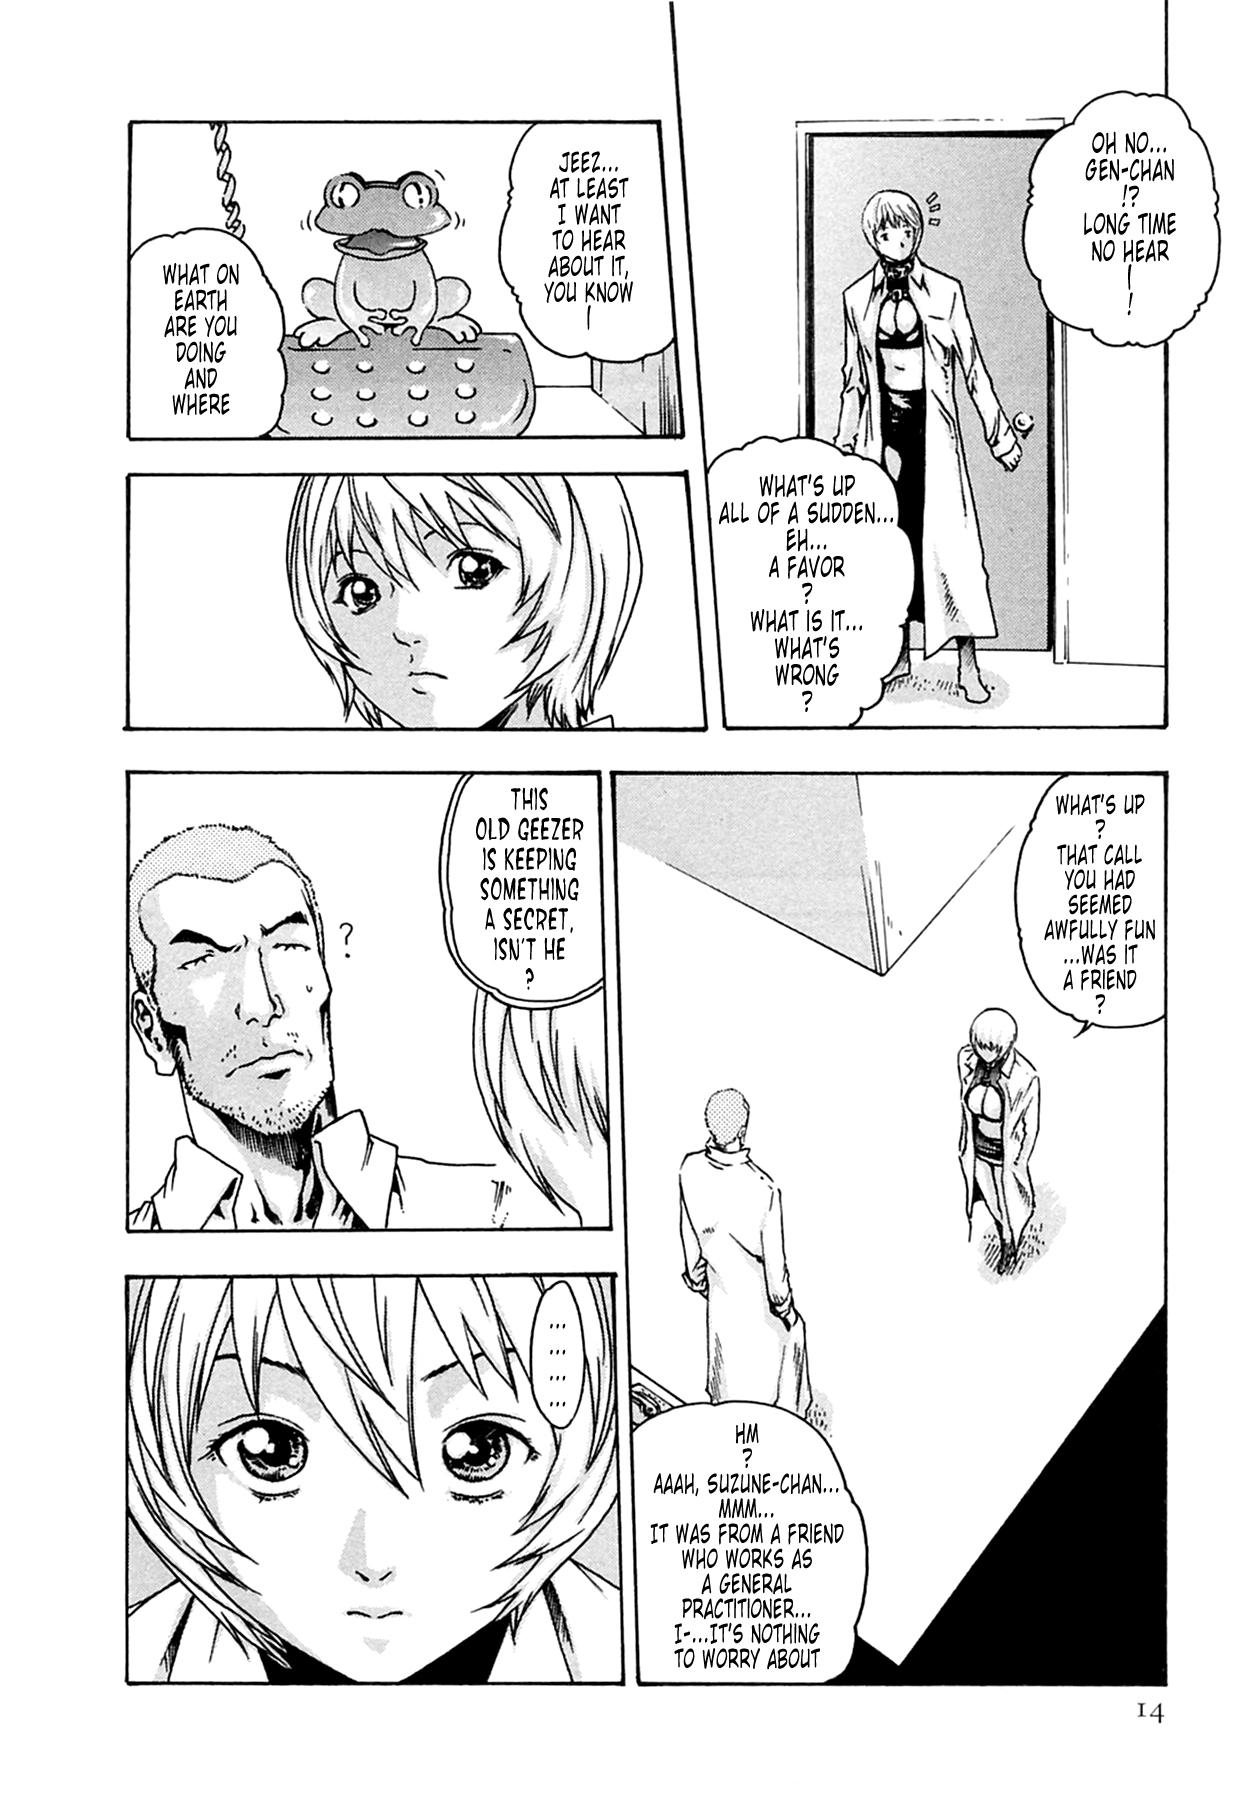 [Haruki] Kisei Juui Suzune (Parasite Doctor Suzune) Vol.02 - CH10-11 13